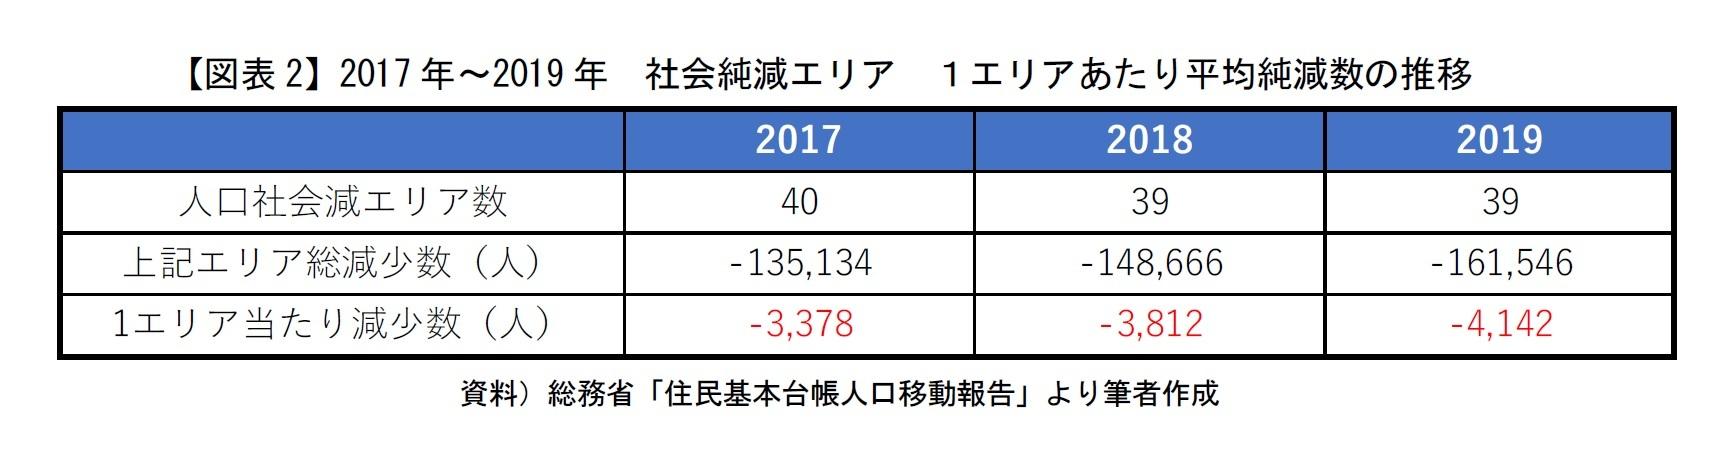 強まる東京一極集中(総数編)社会純減2019都道府県ランキング分析 ...